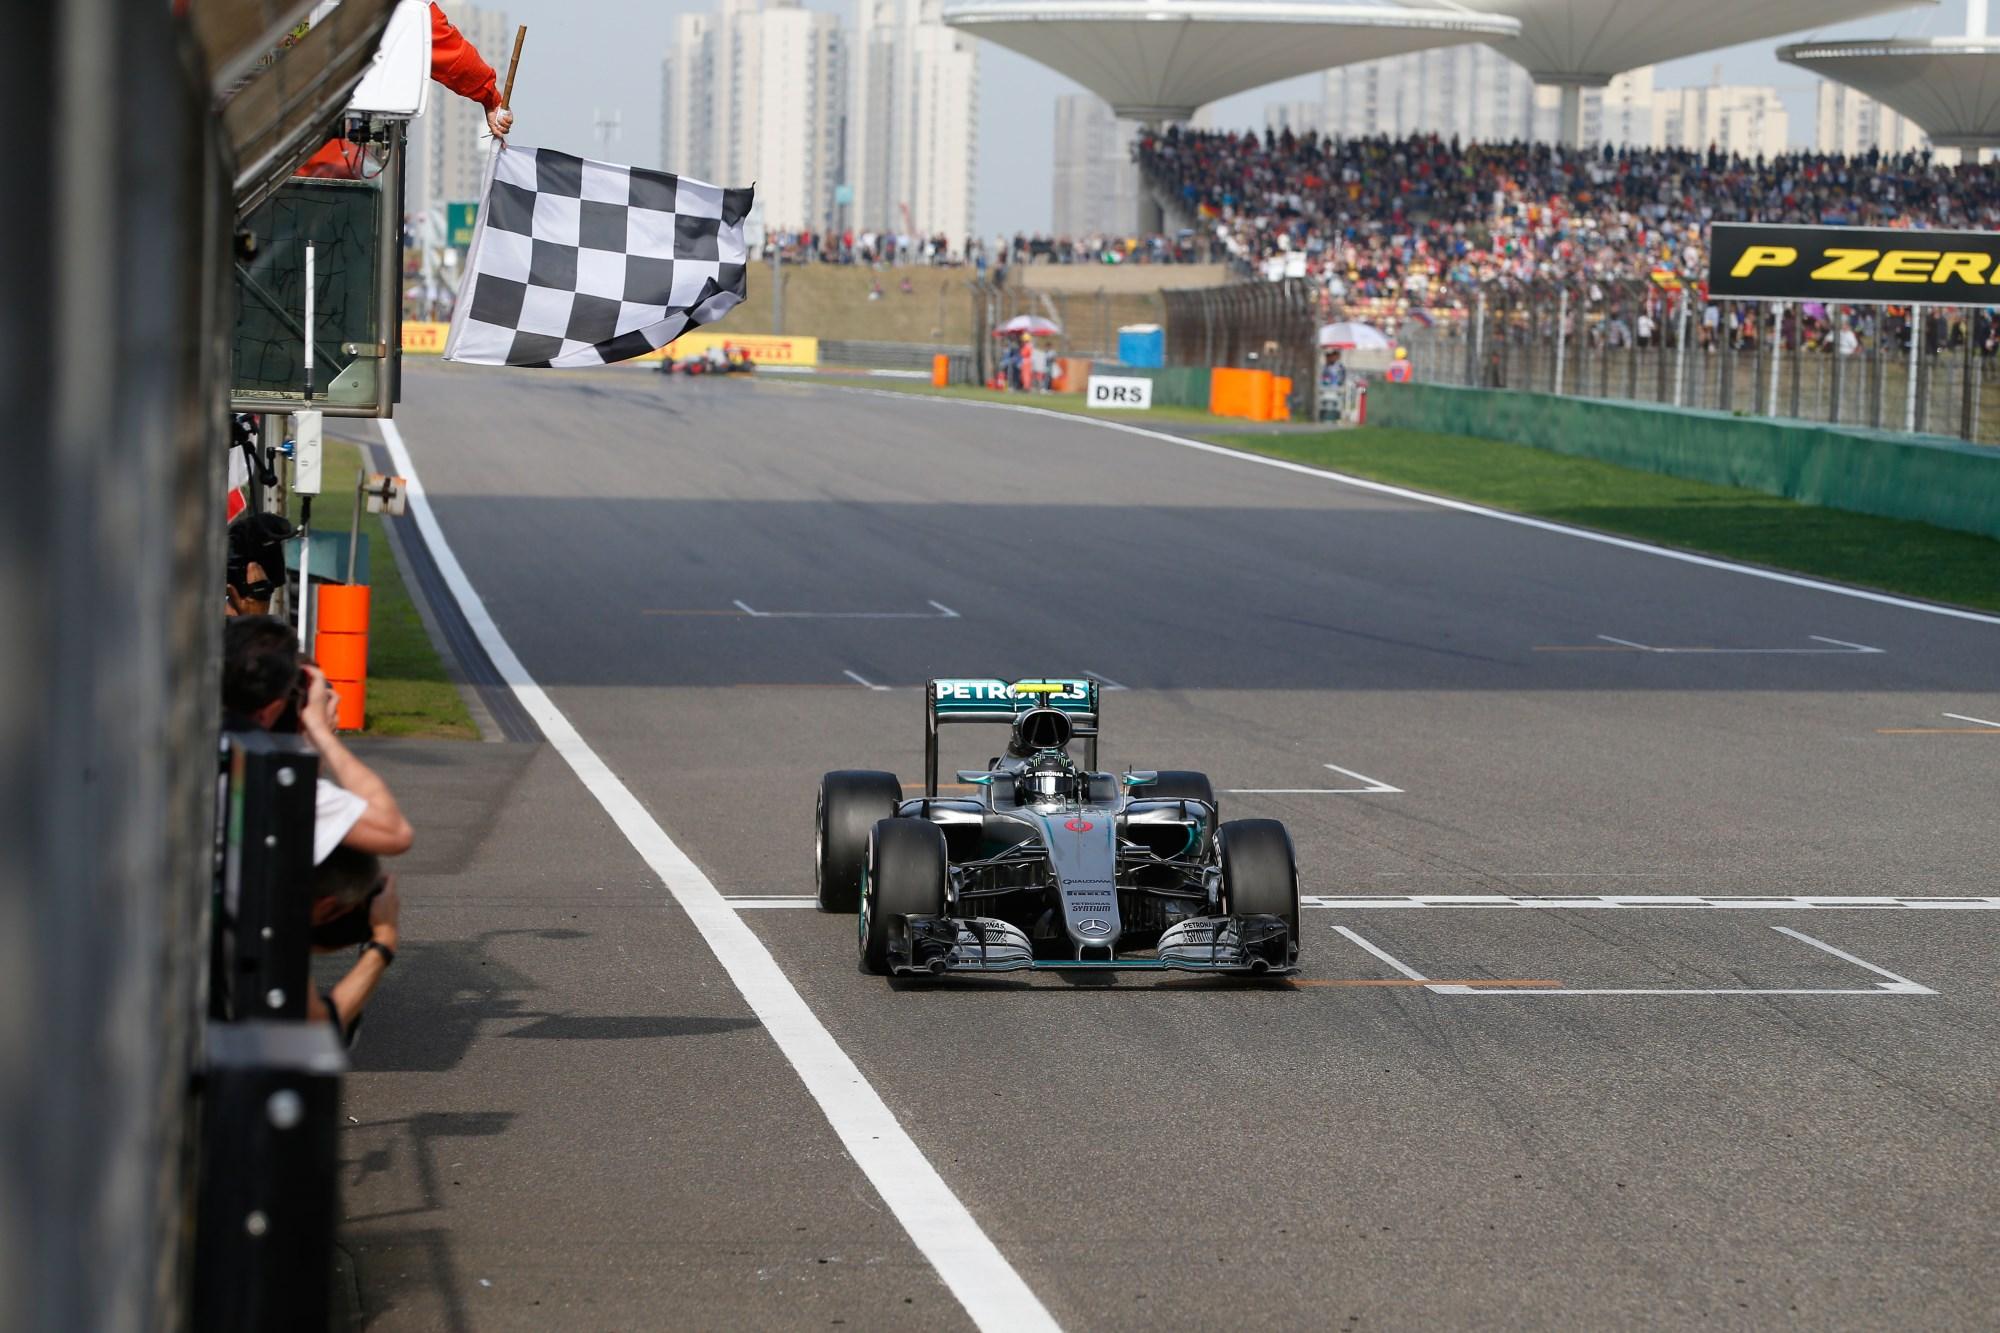 Nico Rosberg Mercedes W07 Hybrid China GP F1 2016 finish line